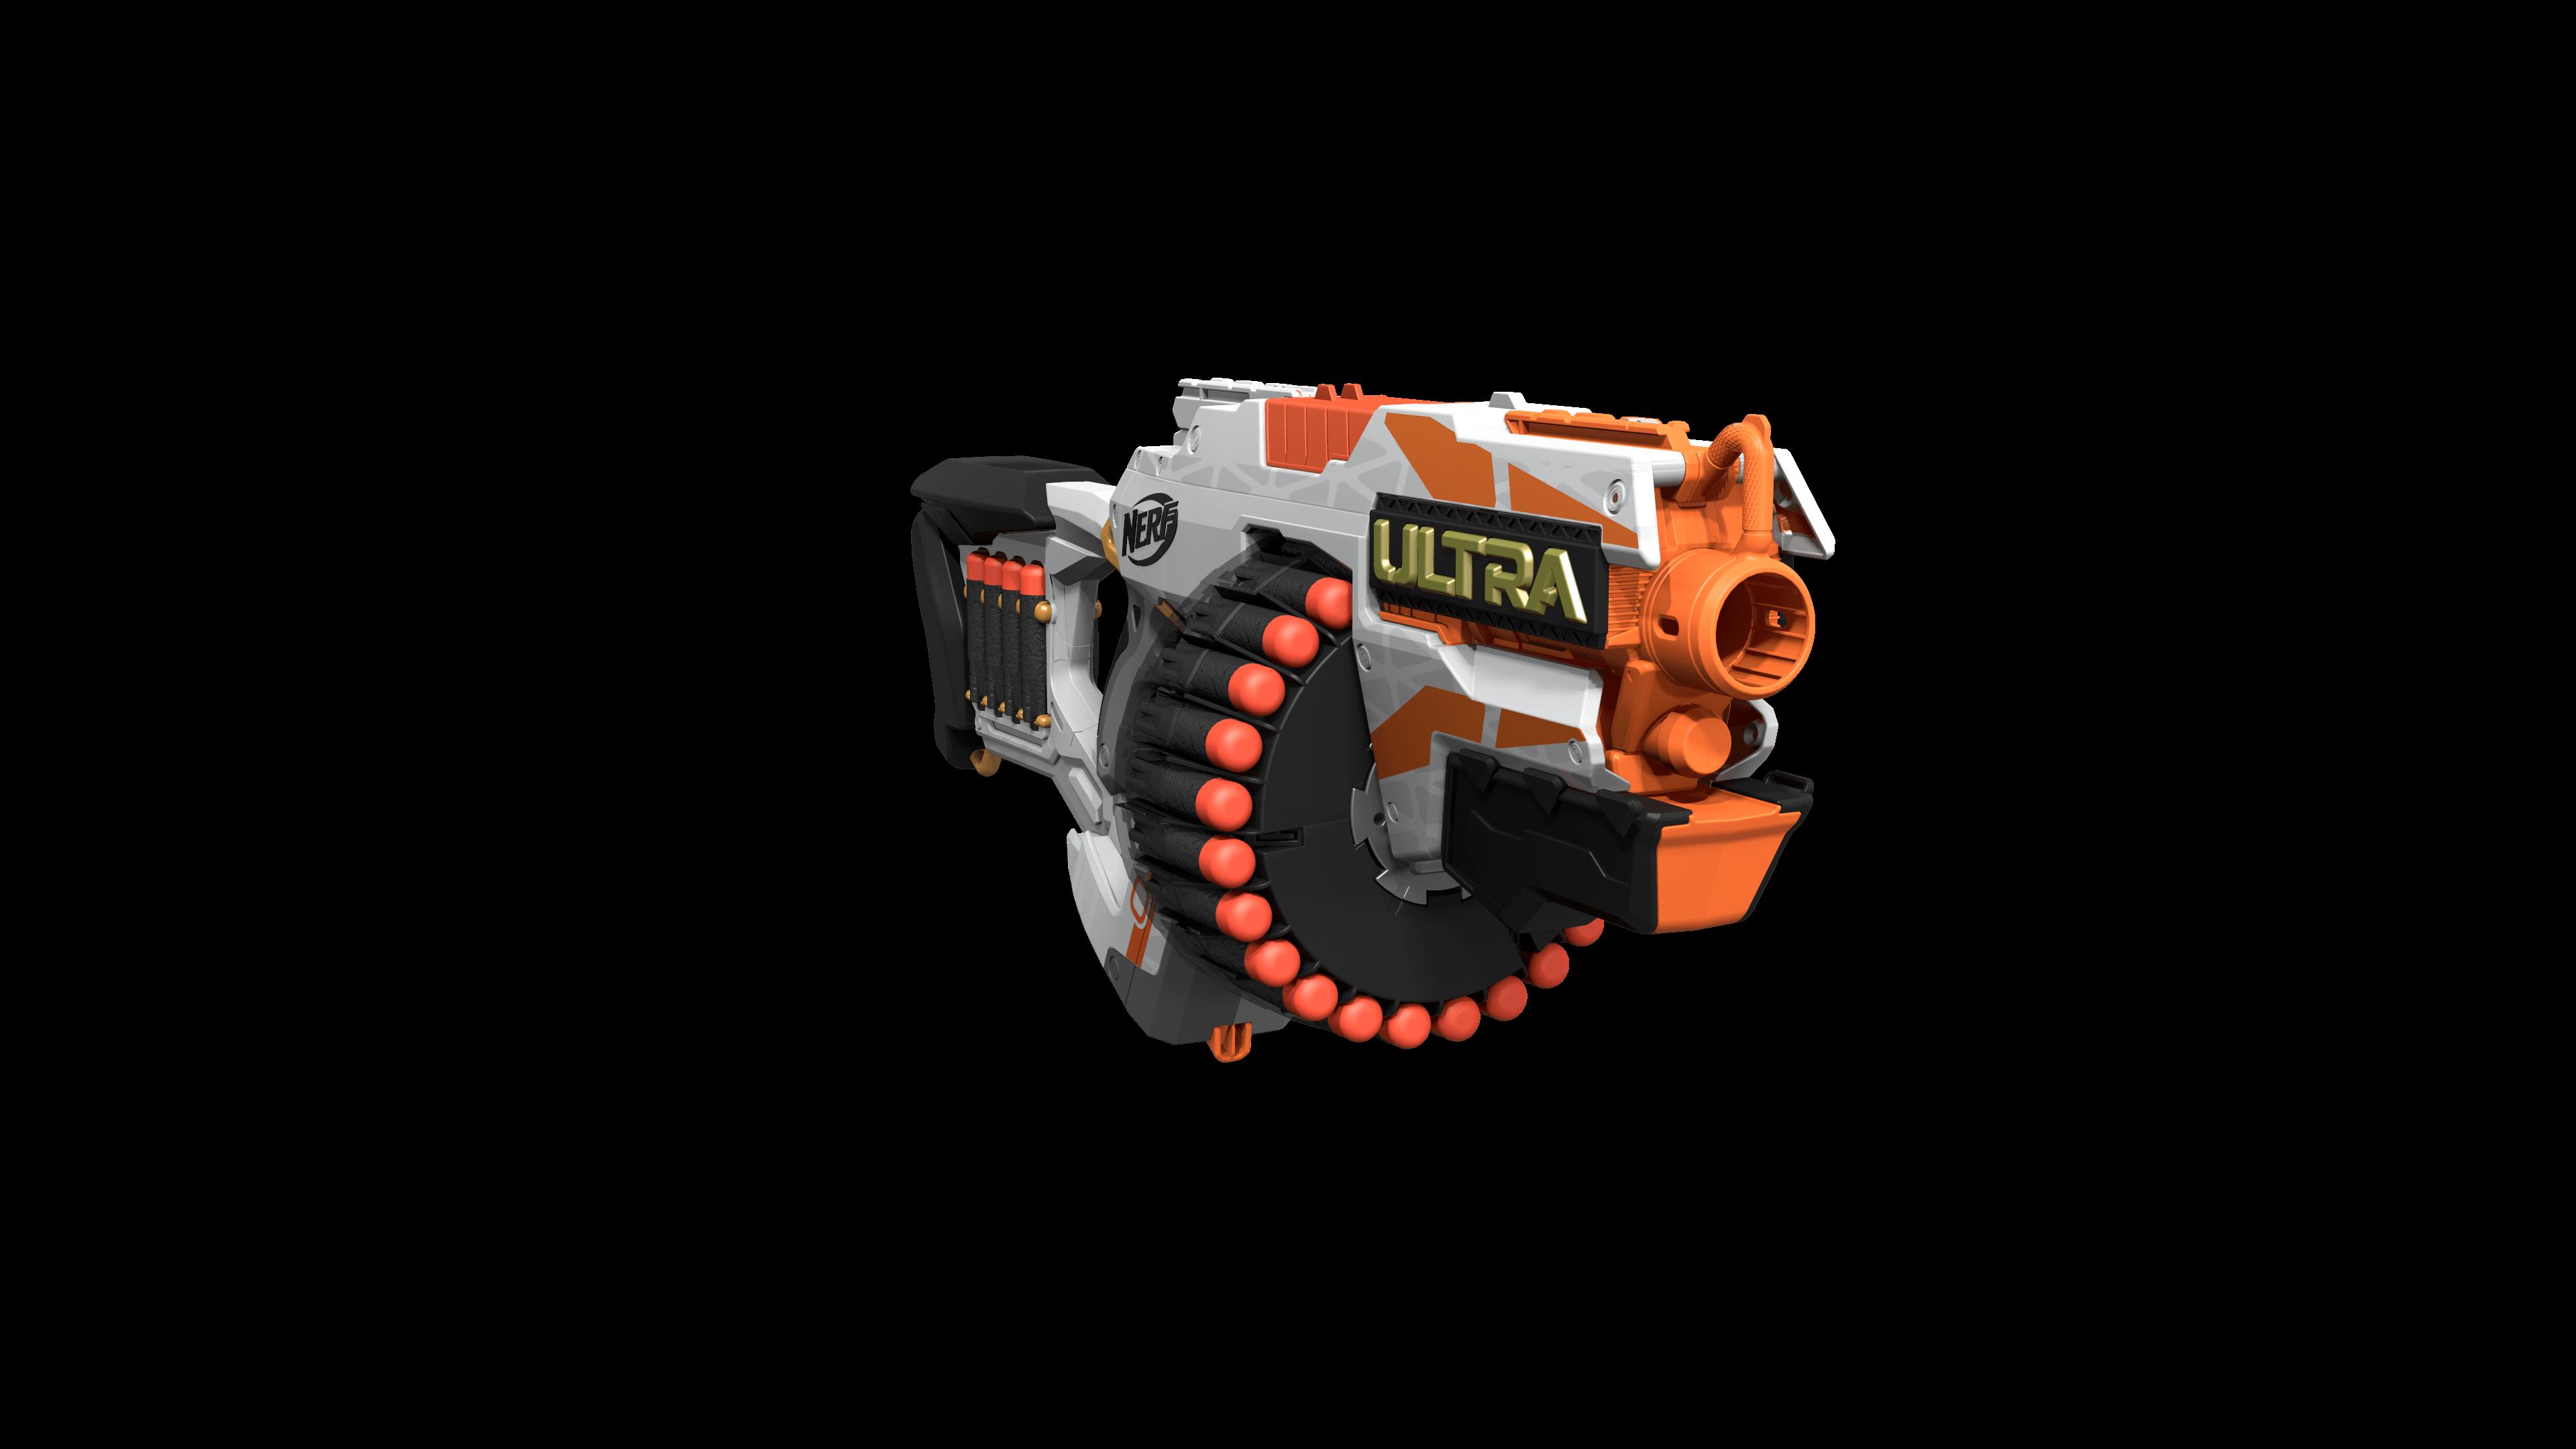 ultra blaster img 100